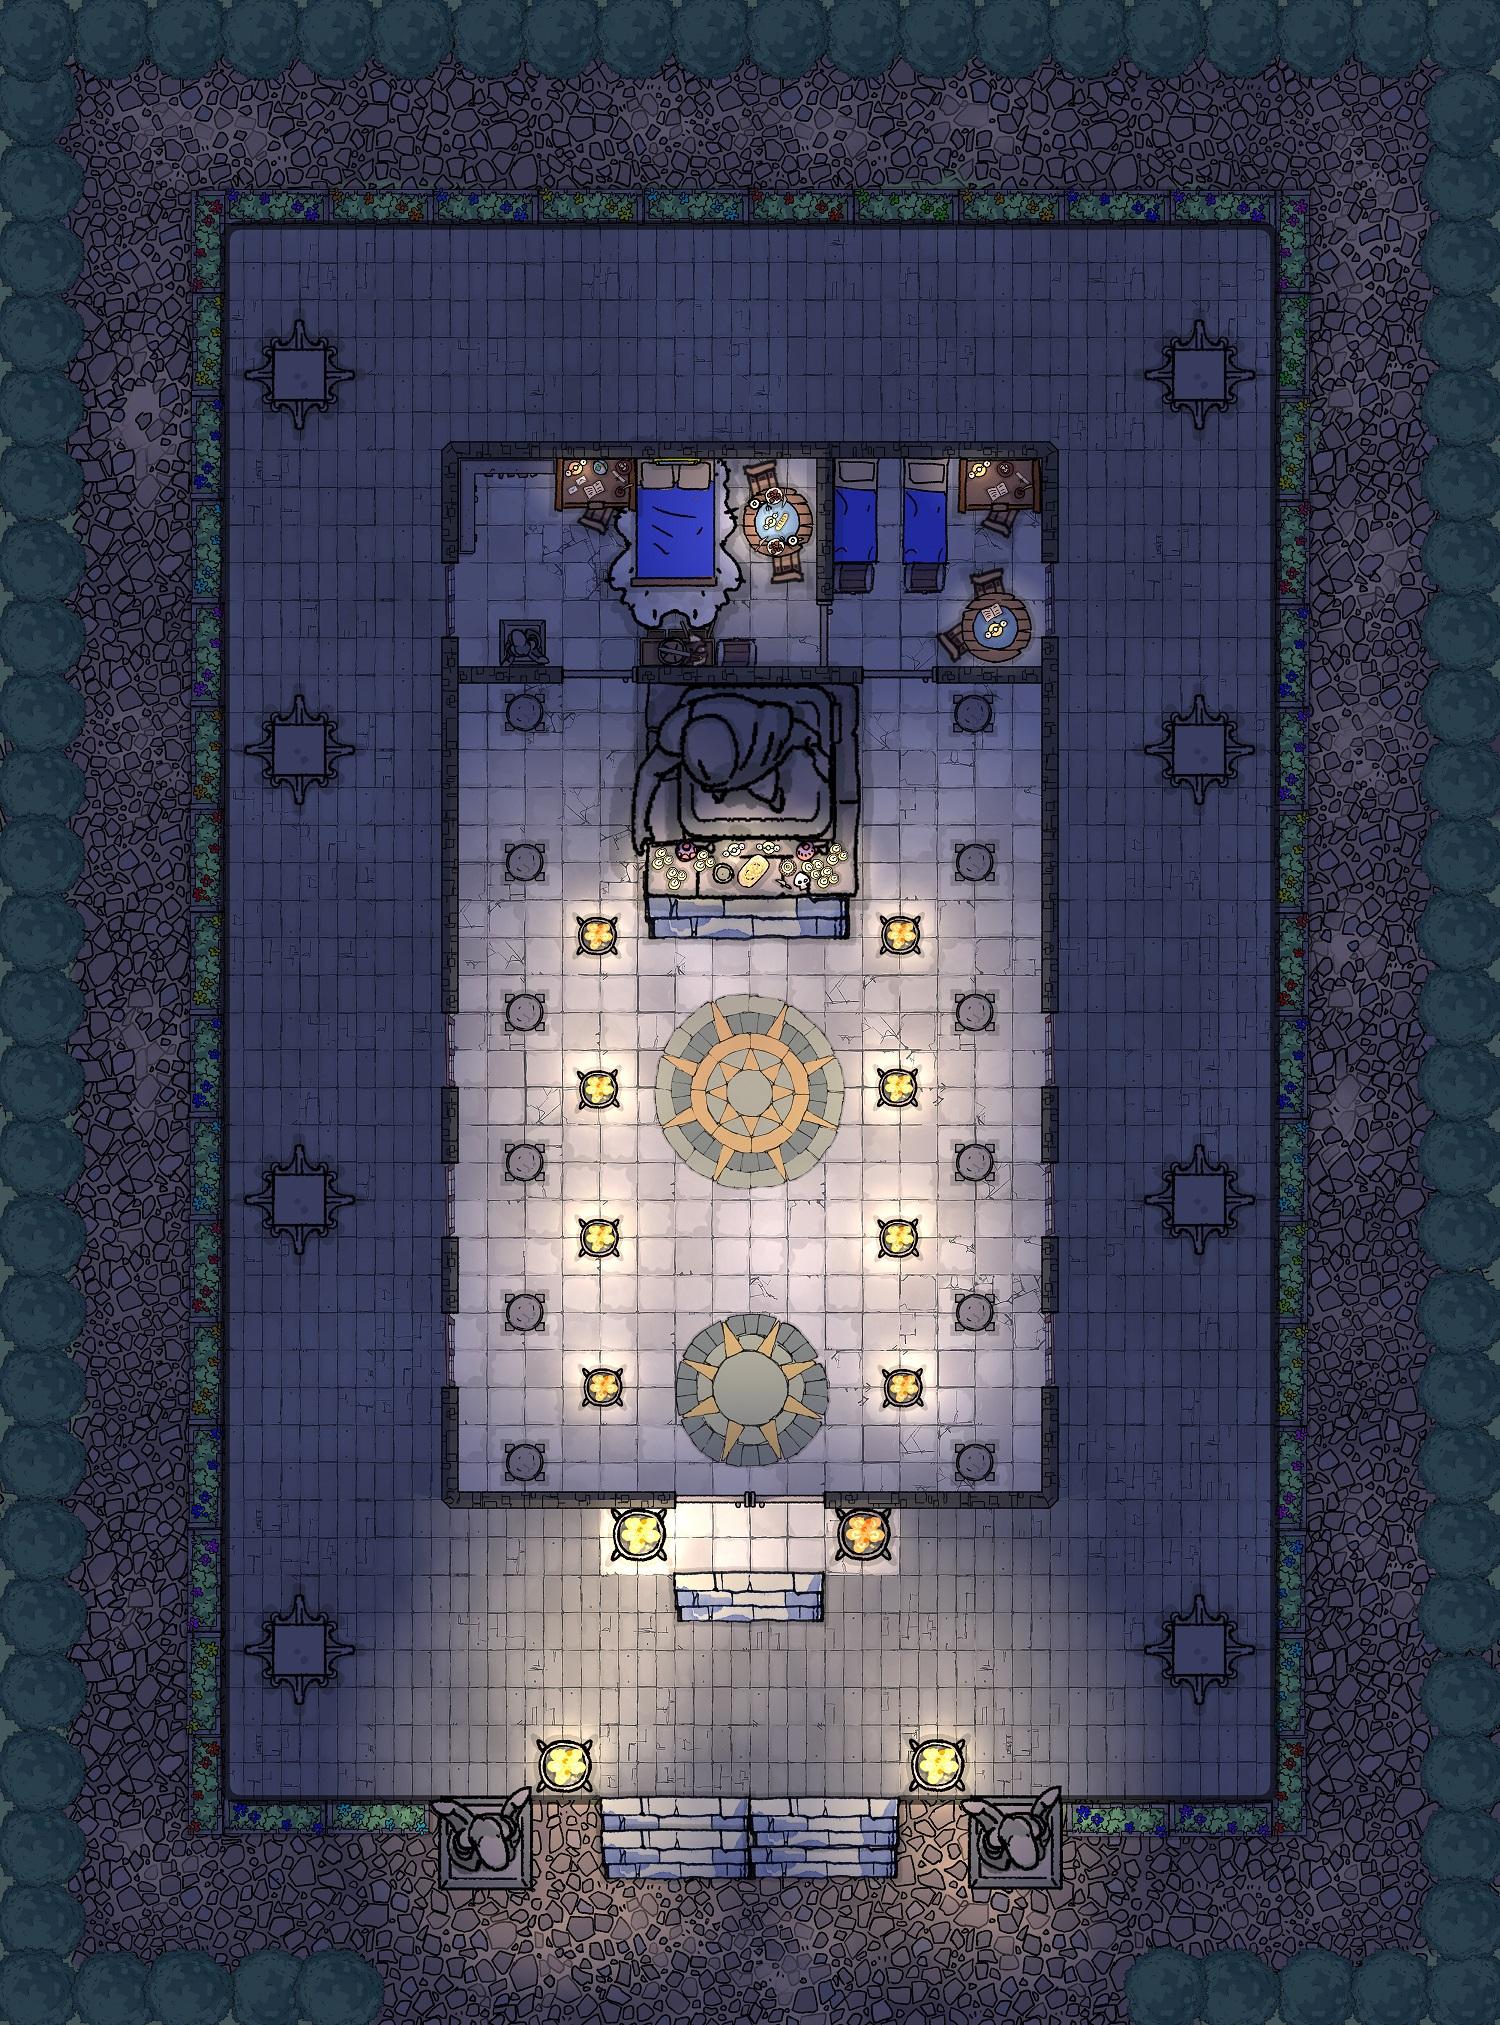 Temple of Helios night no grid 20 x 27 reduced.jpg